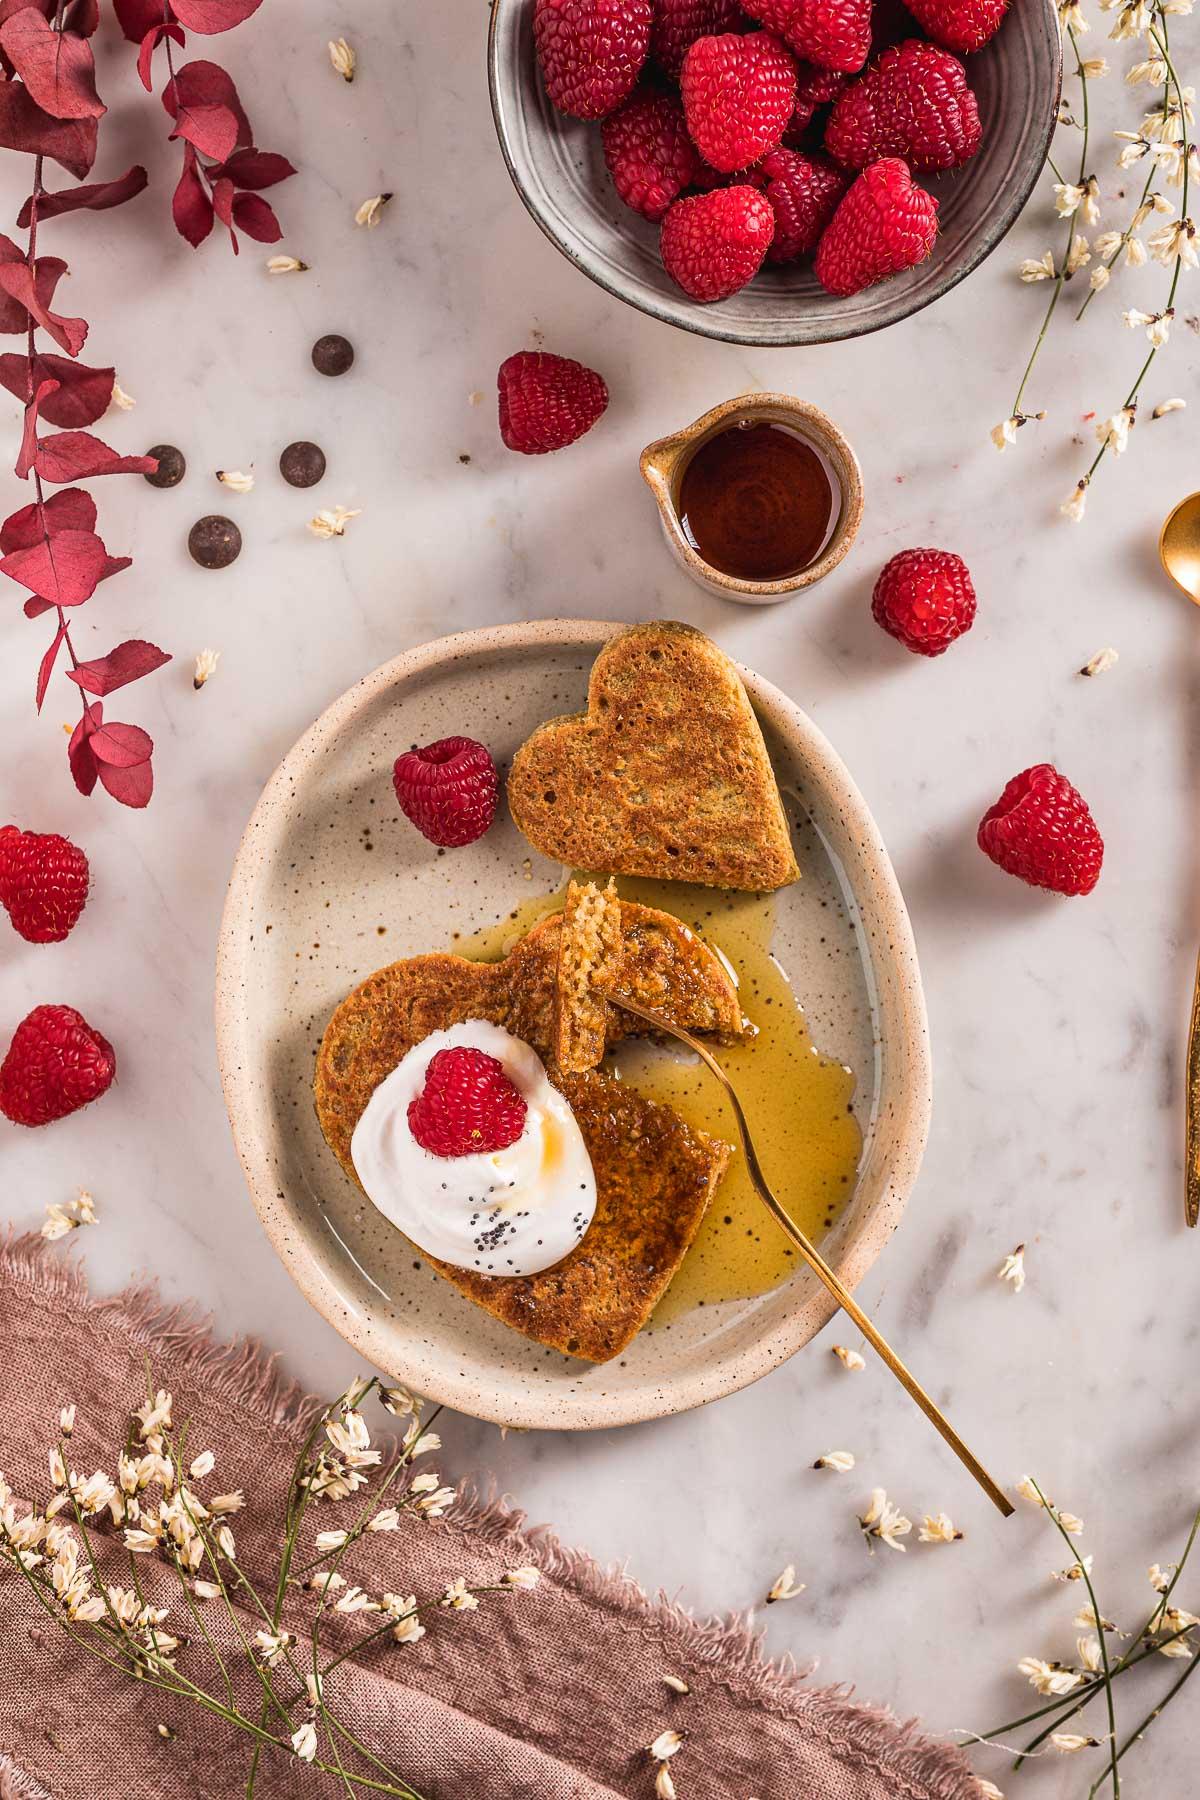 pancakes di San Valentino how to make blender gluten-free vegan oat pancakes nut-free valentine's day pancakes Pancakes vegan senza glutine all'avena e cioccolato facili light senza frutta secca